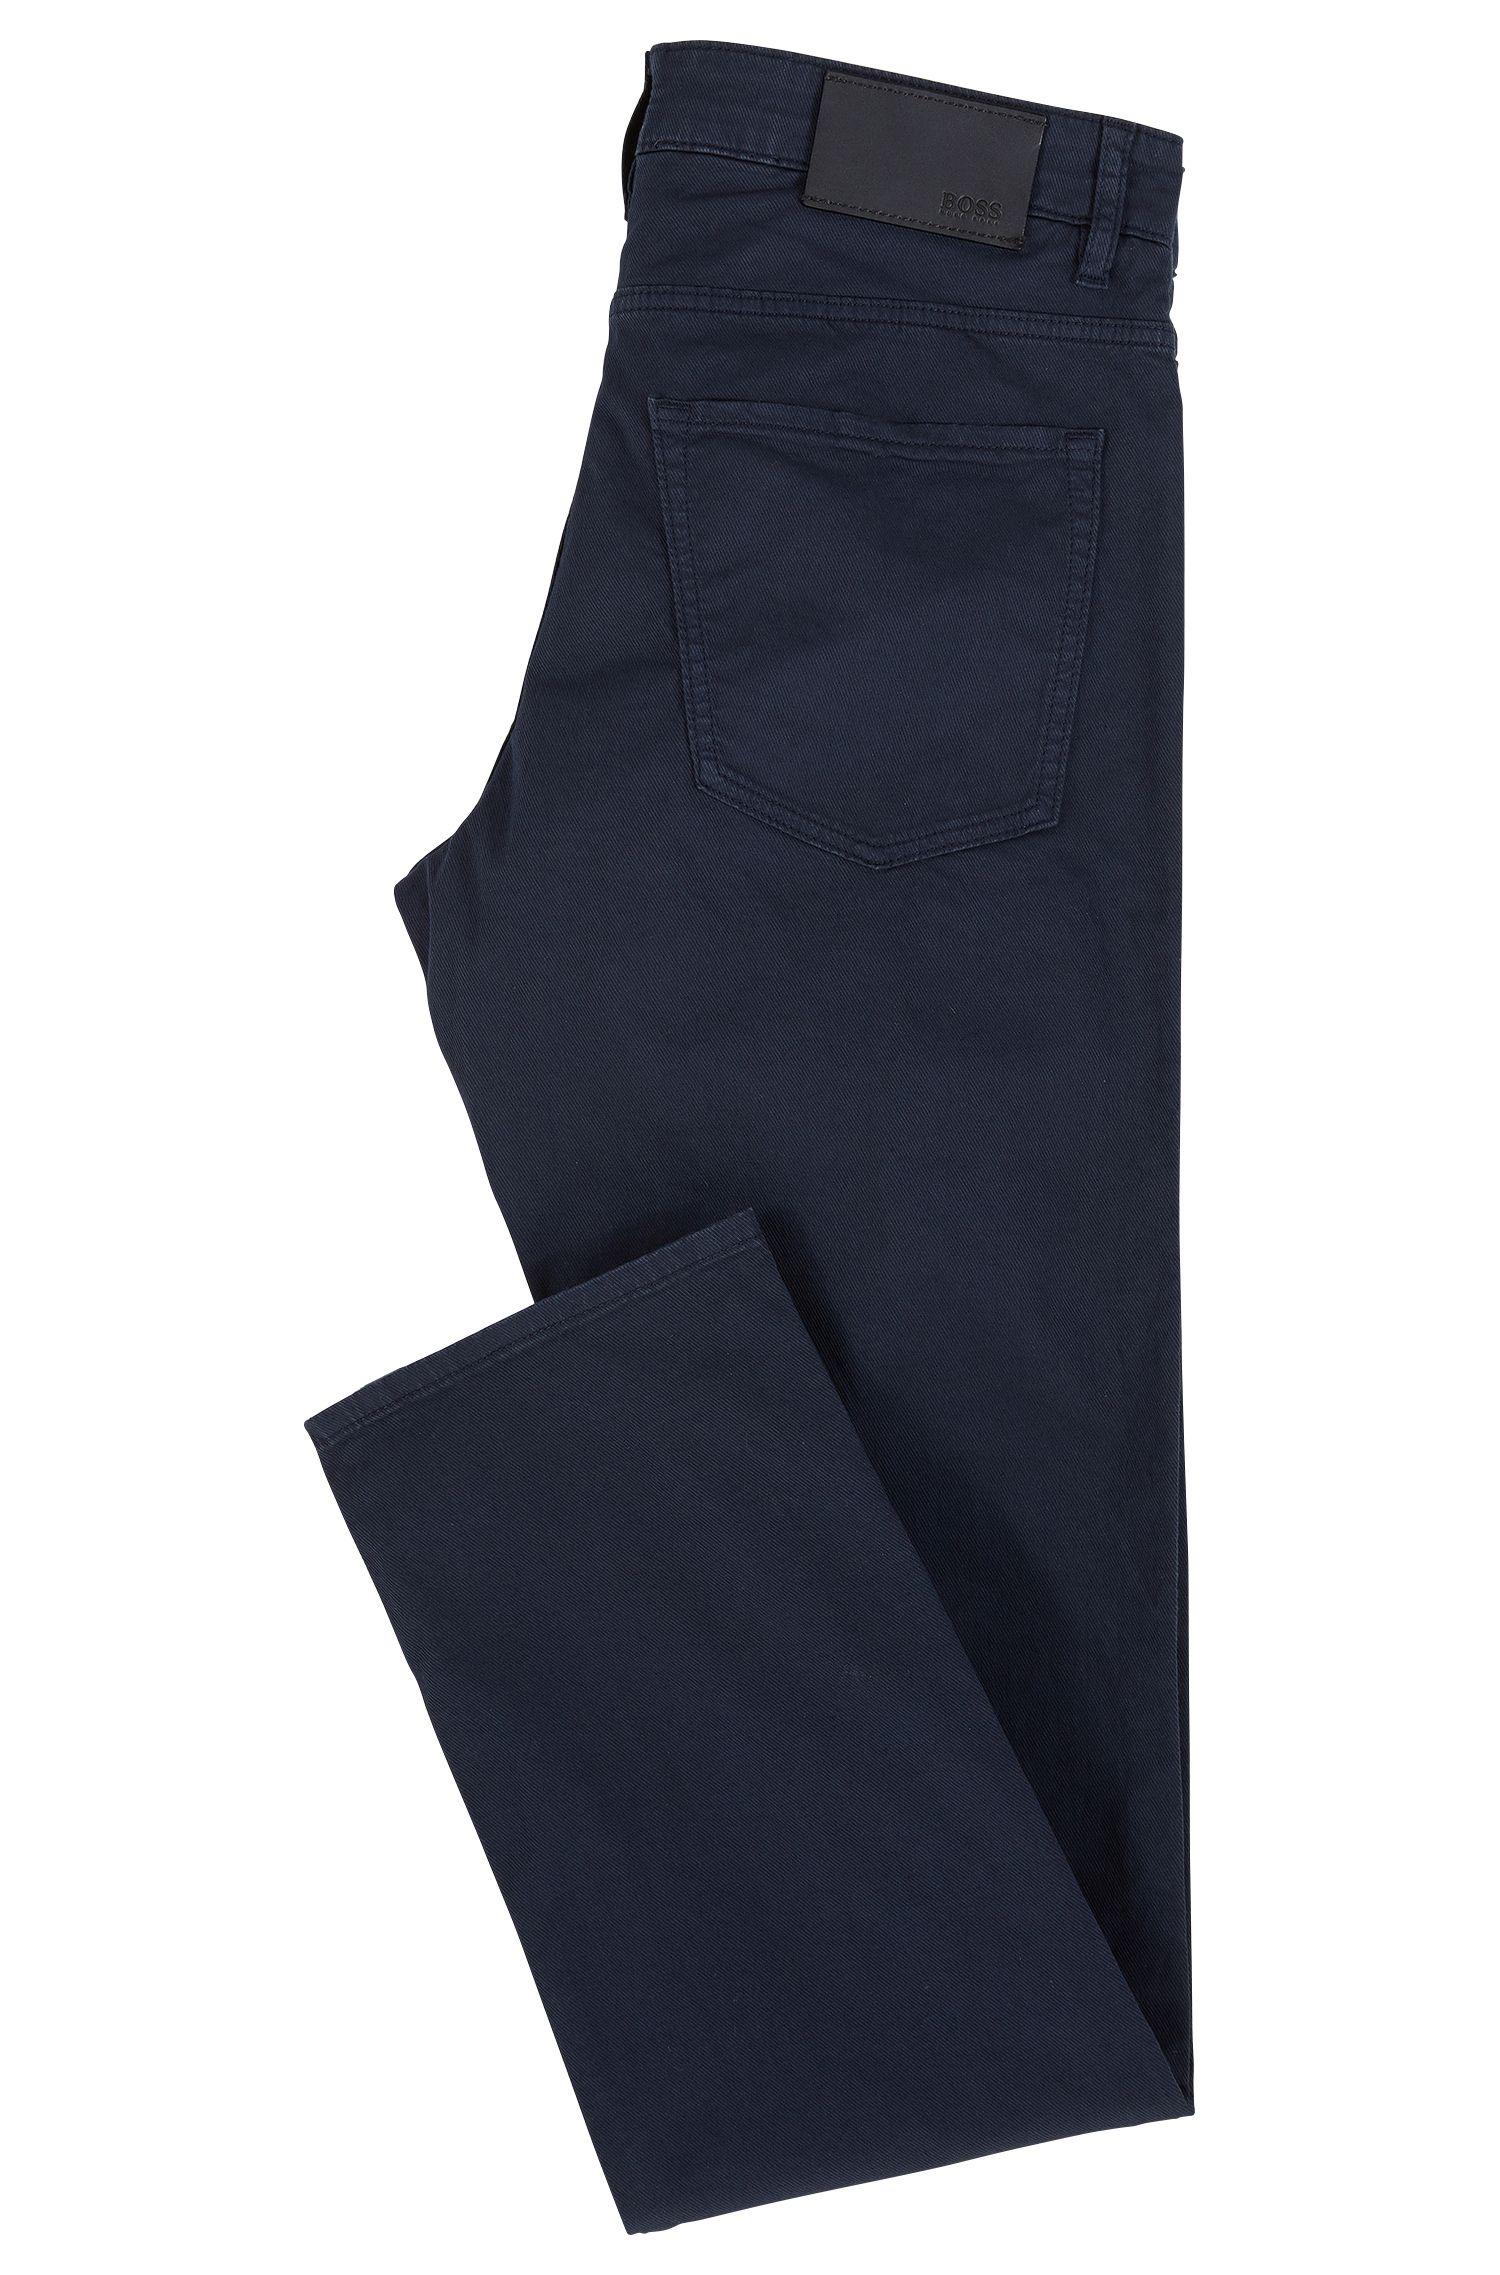 Slim-fit garment-dyed jeans in gekeperde stretchkatoen